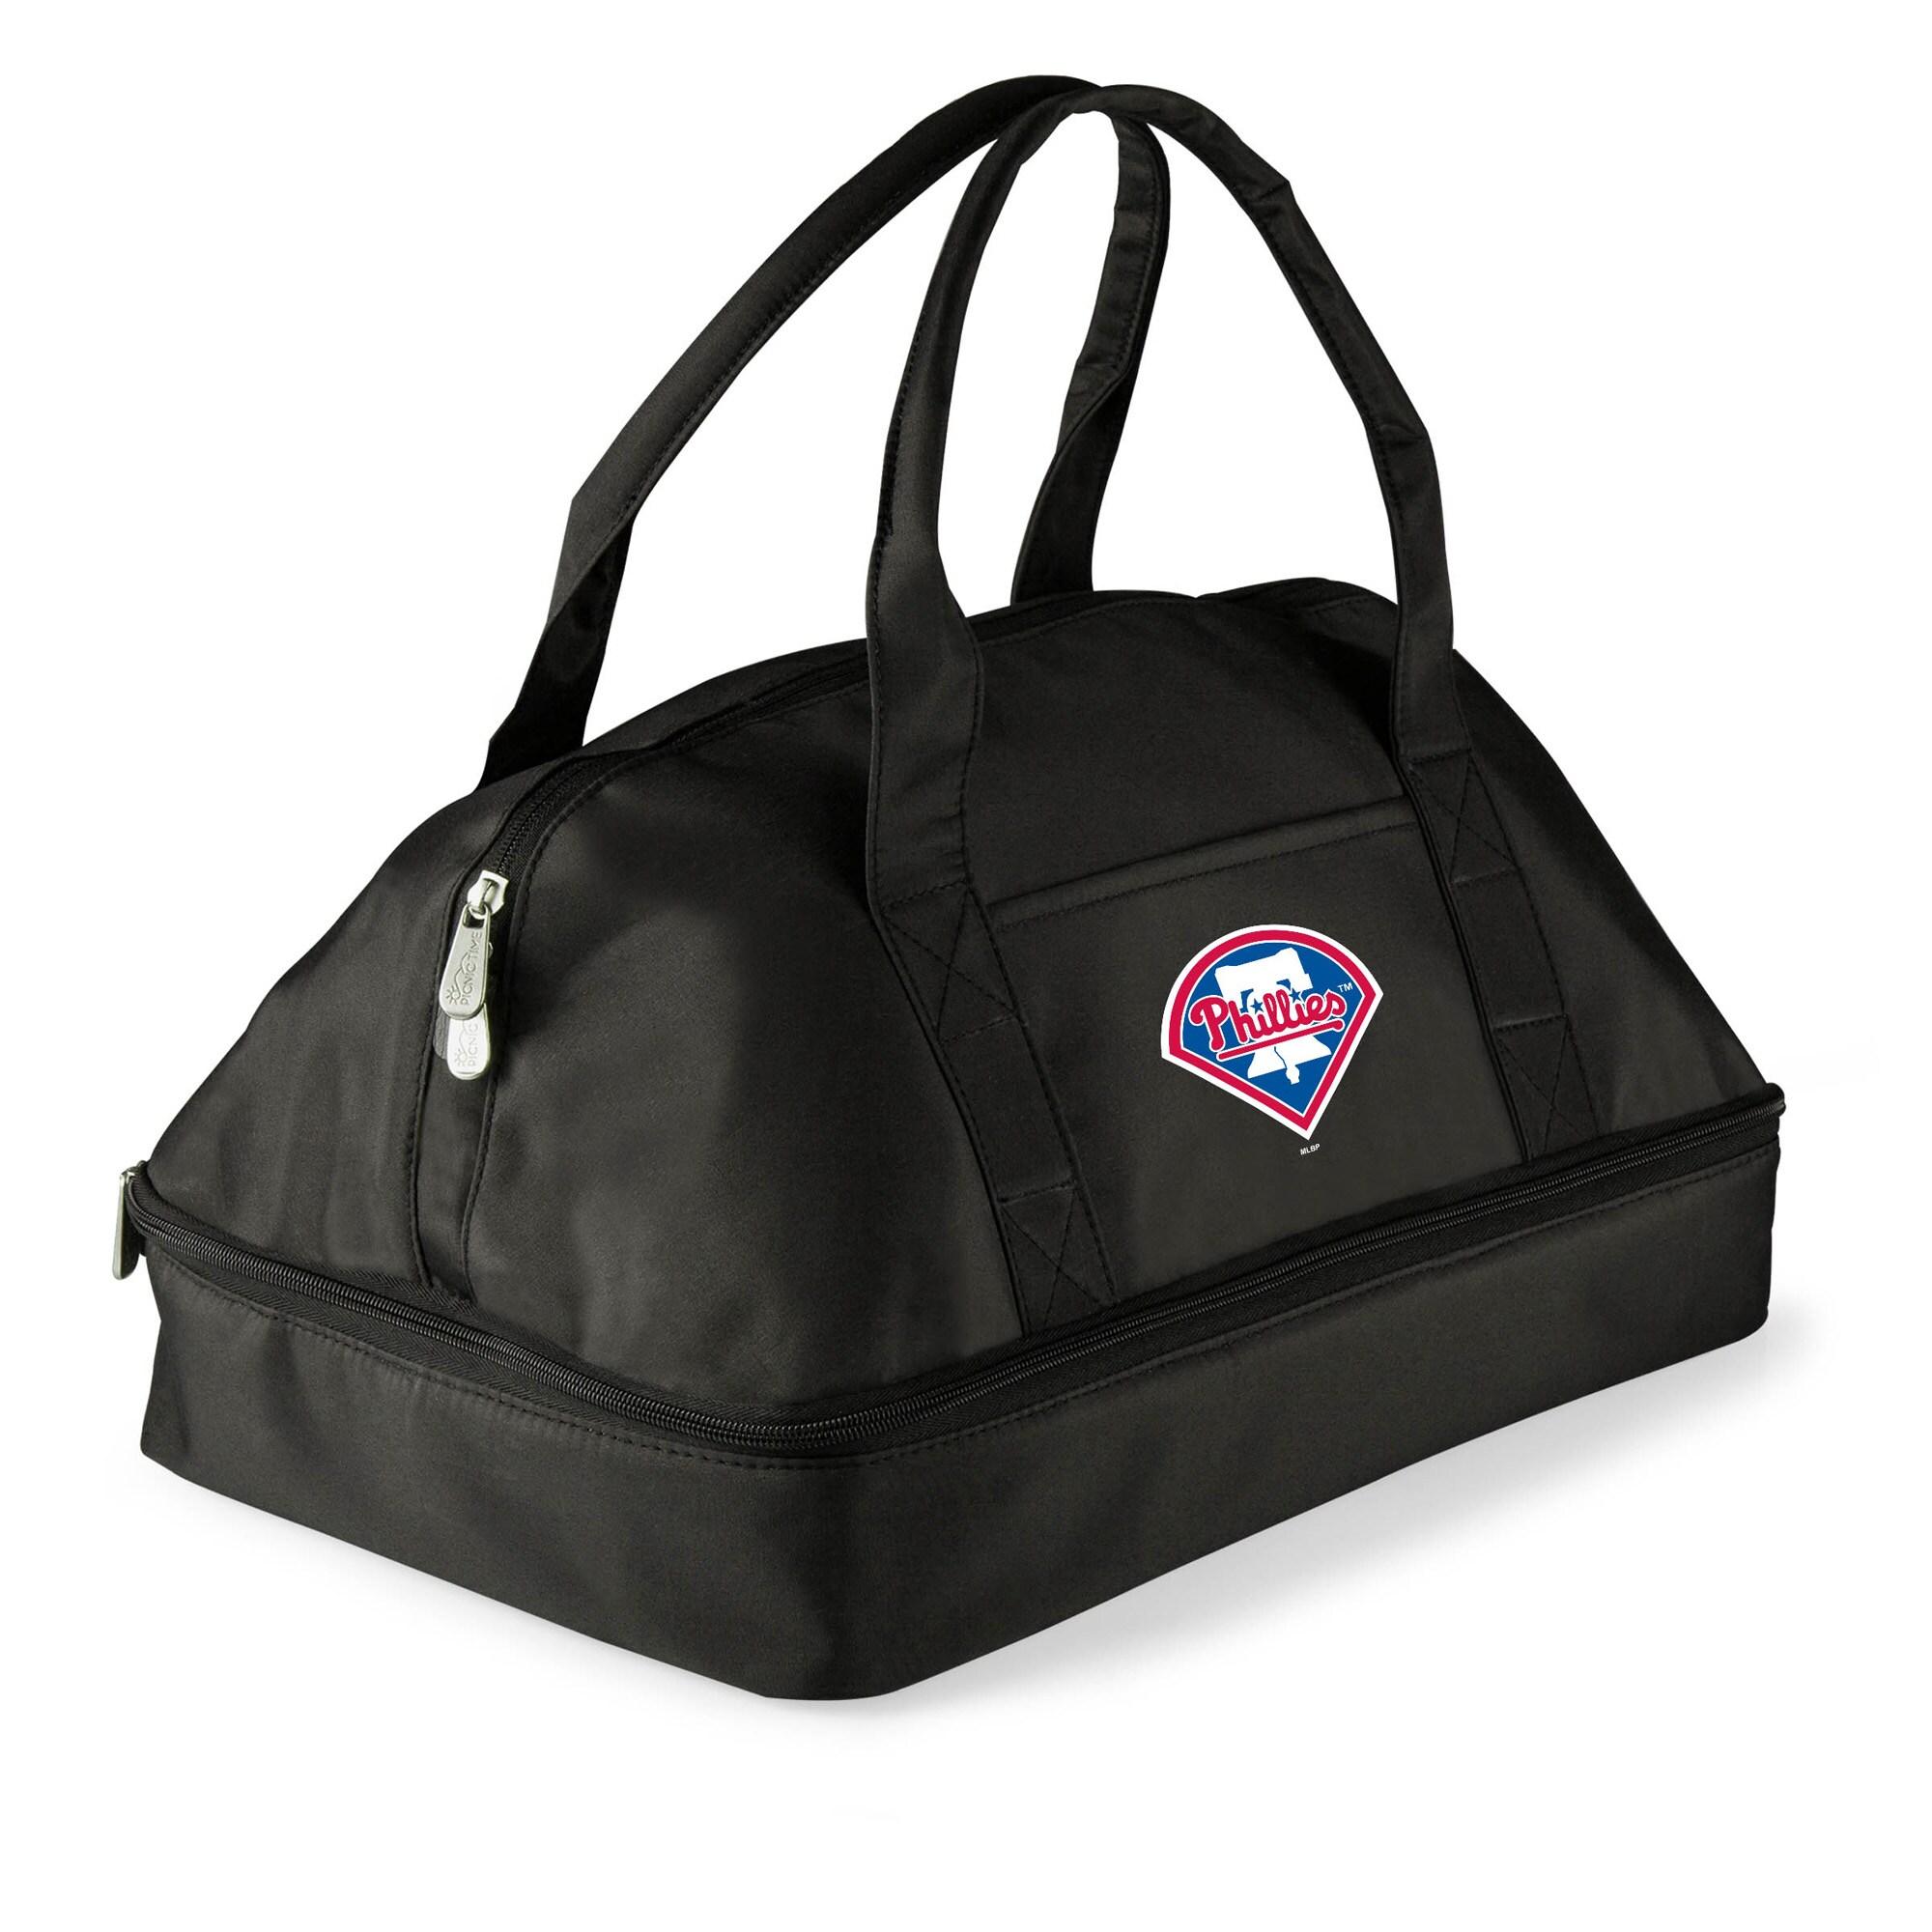 Philadelphia Phillies Potluck Casserole Tote - Black